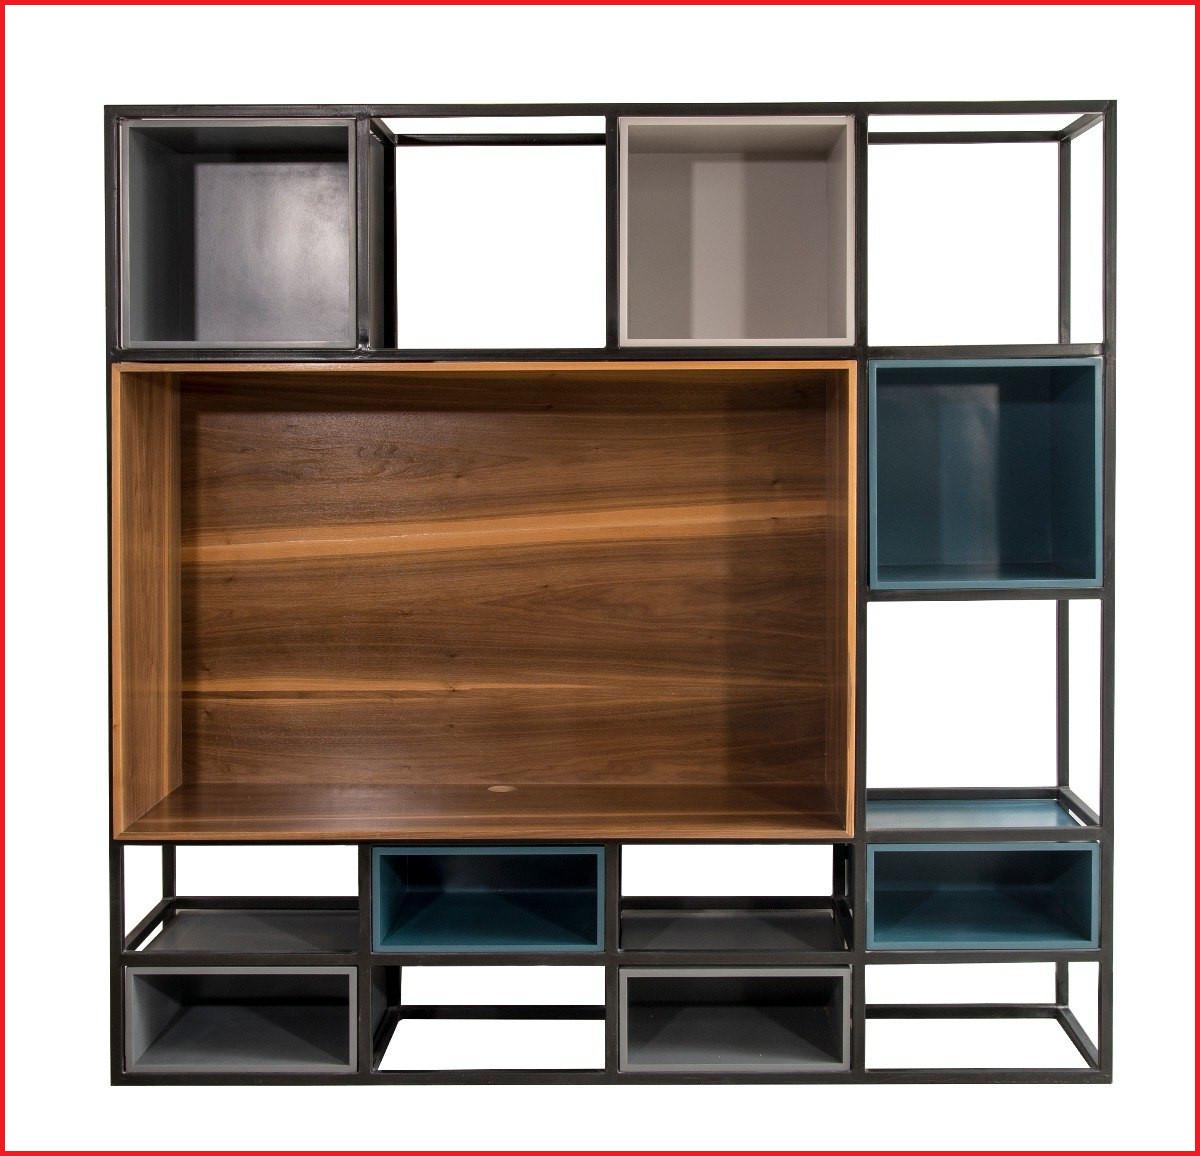 Mueble Tv Pequeño E9dx Muebles Para Baà Os Modernos Un Mueble Para El Televisor